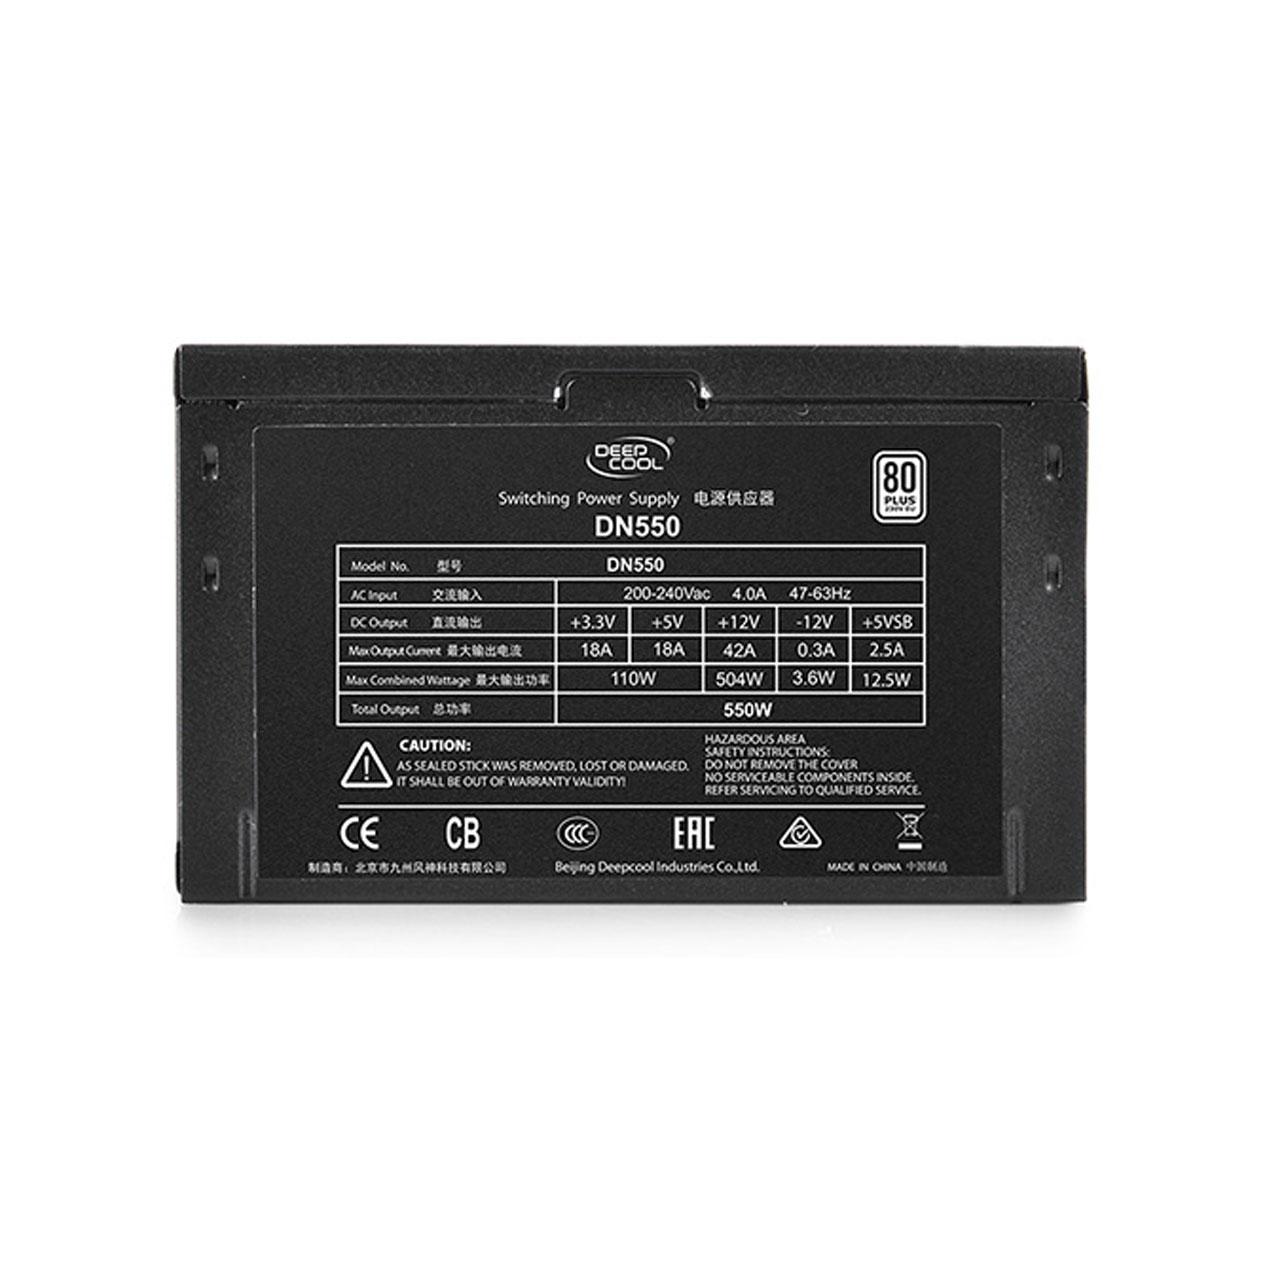 منبع-تغذیه-کامپیوتر-36دیپ-کول-مدل-DN550